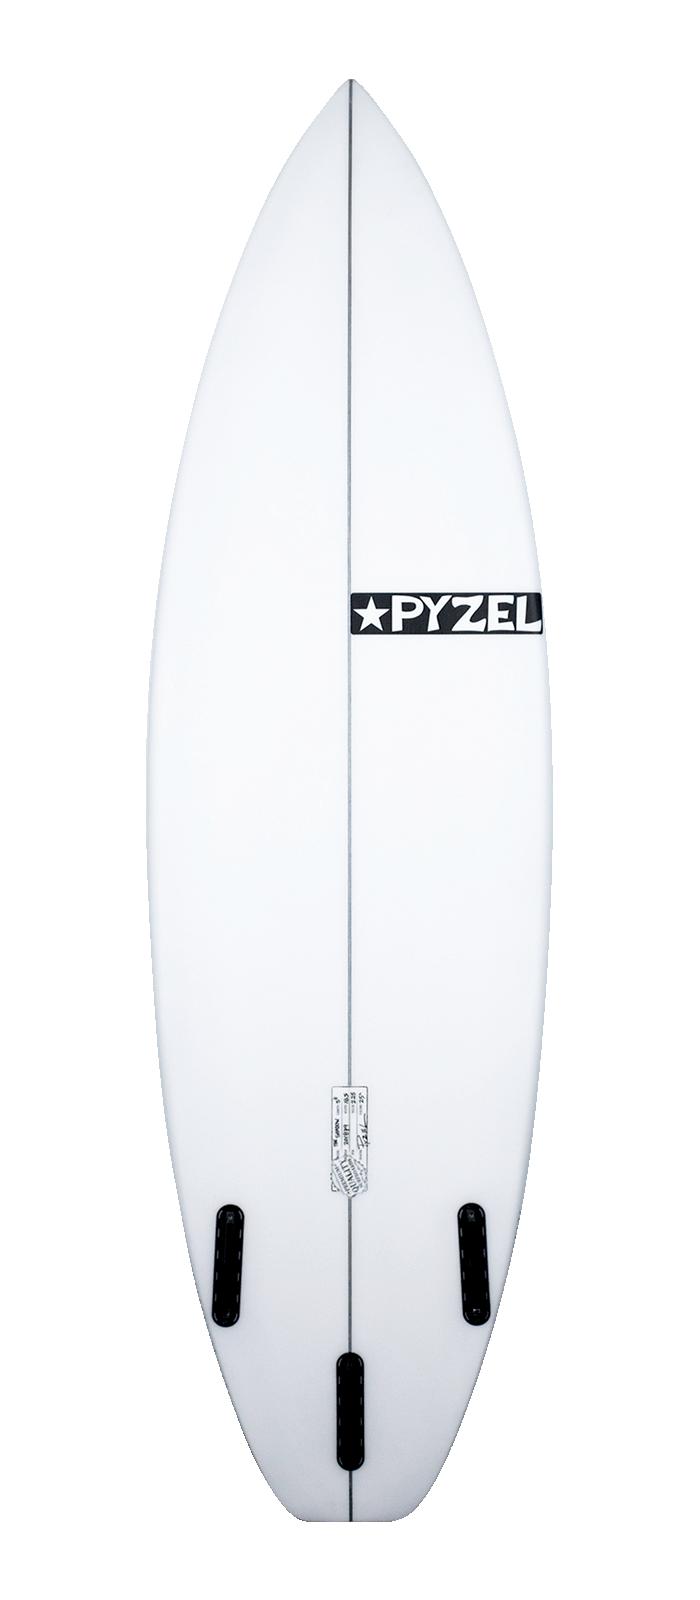 SHADOW XL surfboard model bottom